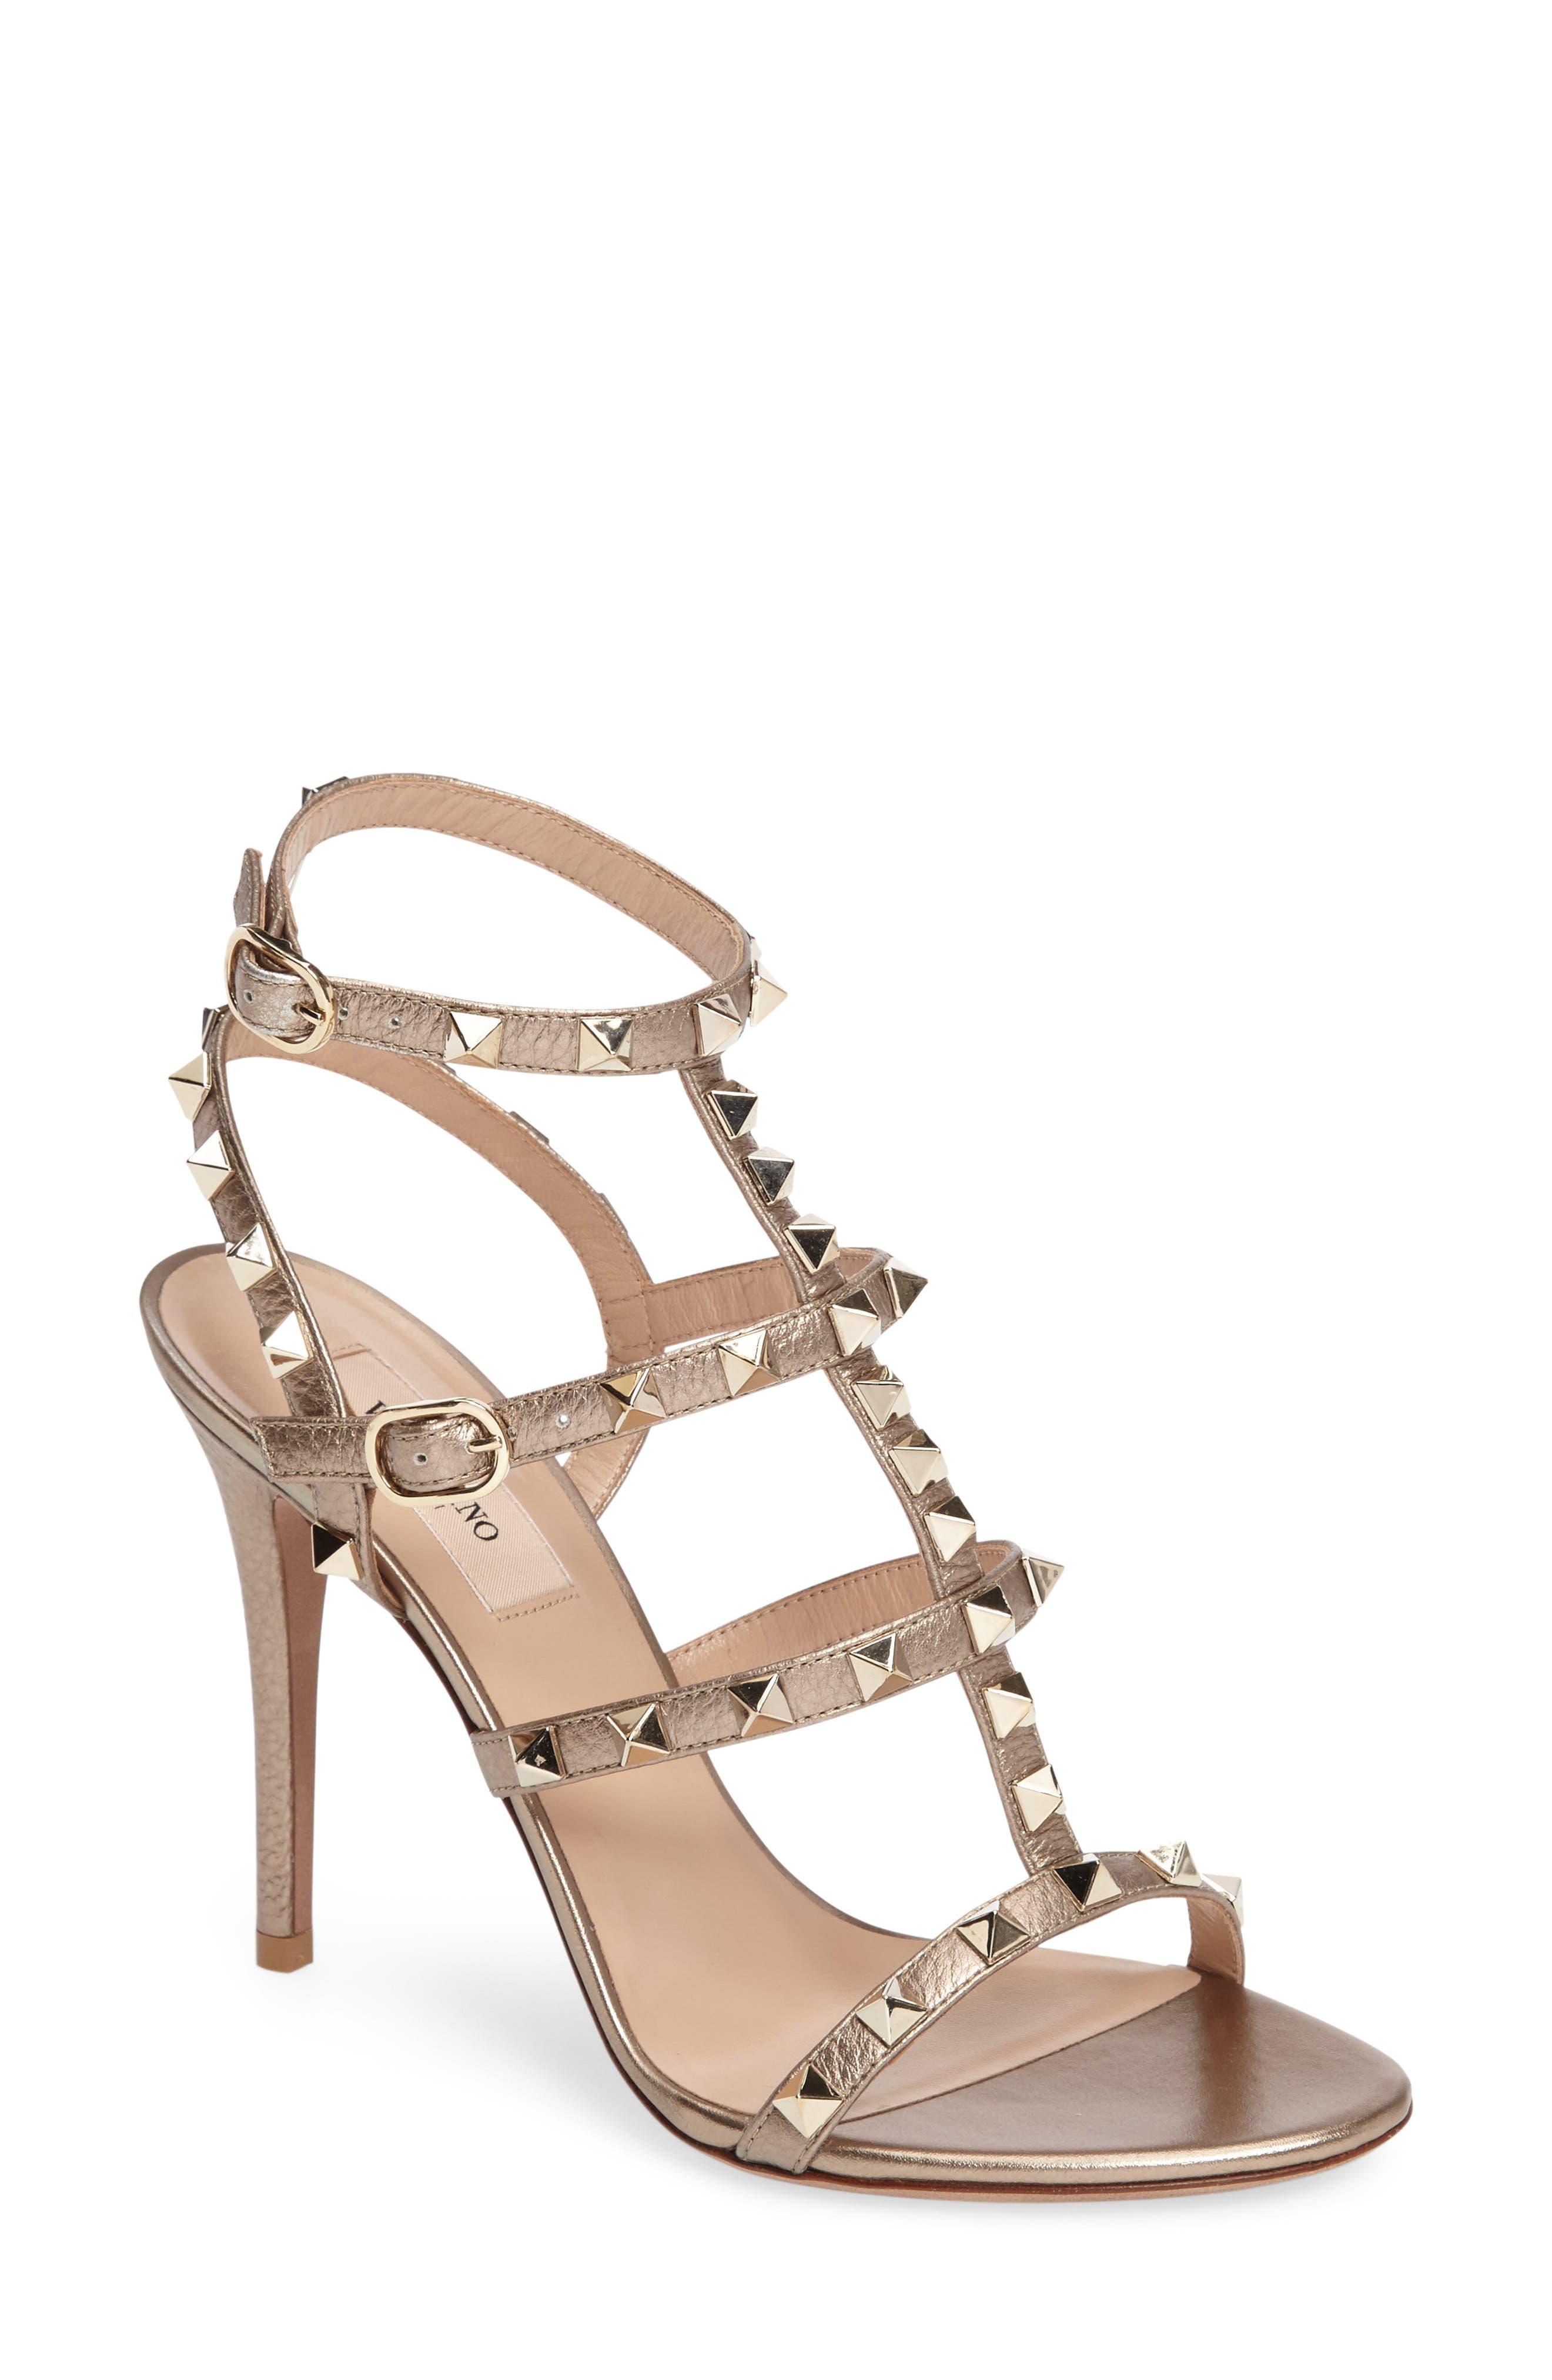 VALENTINO 'Rockstud' Ankle Strap Sandal